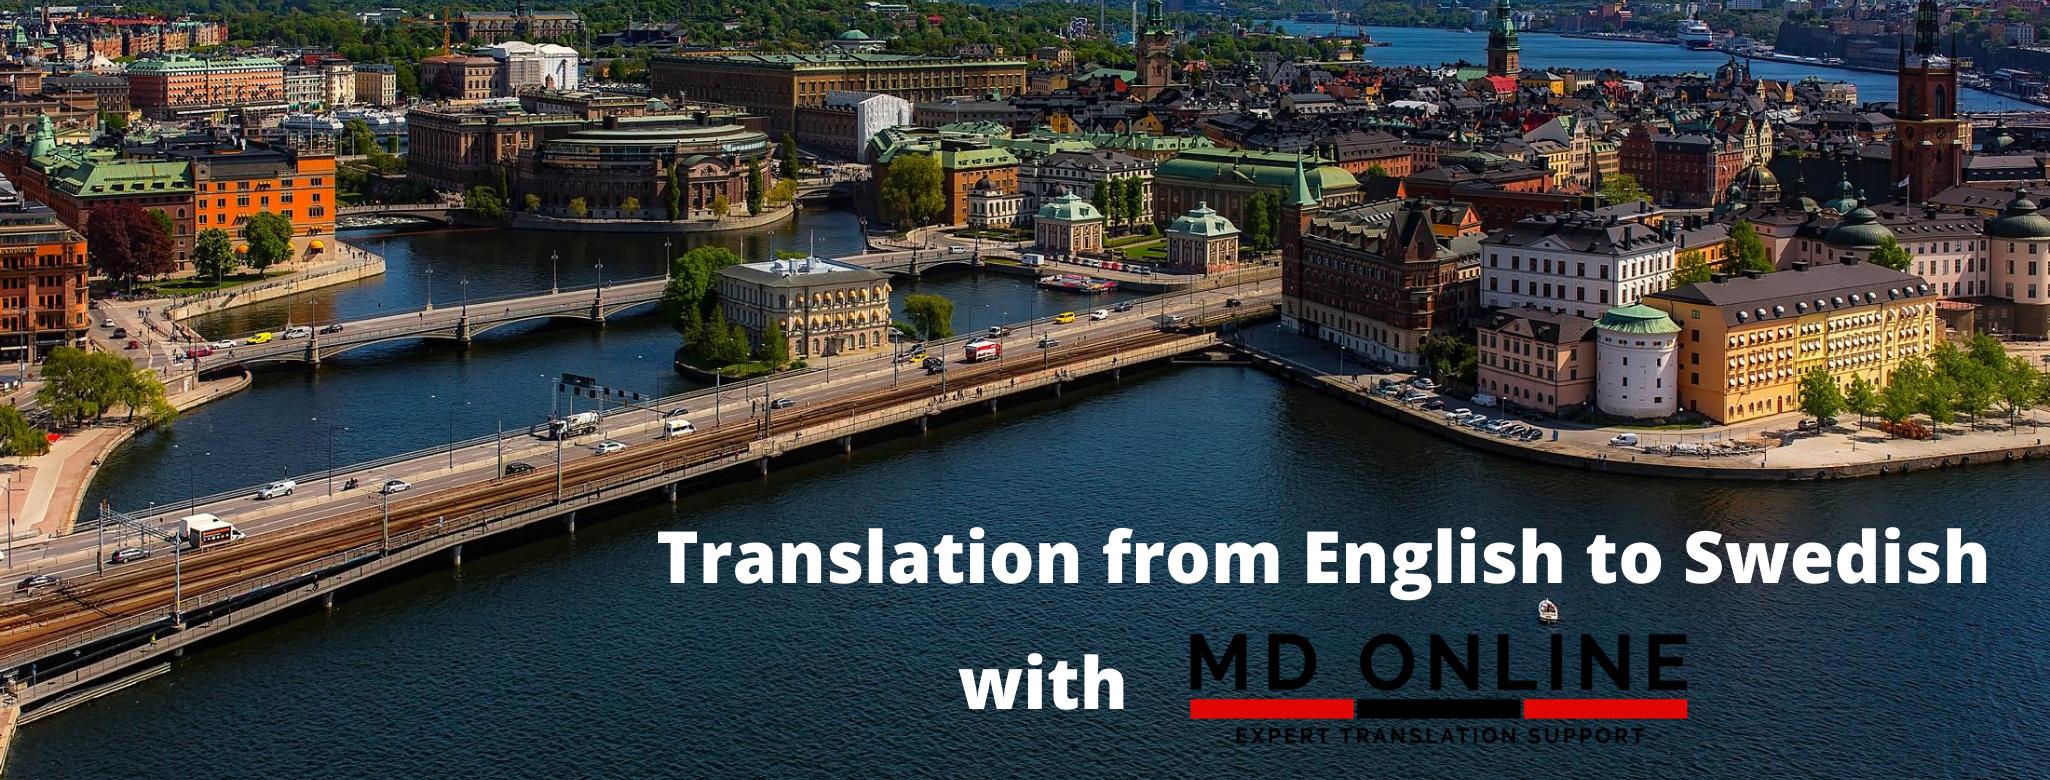 translation from English to Swedish